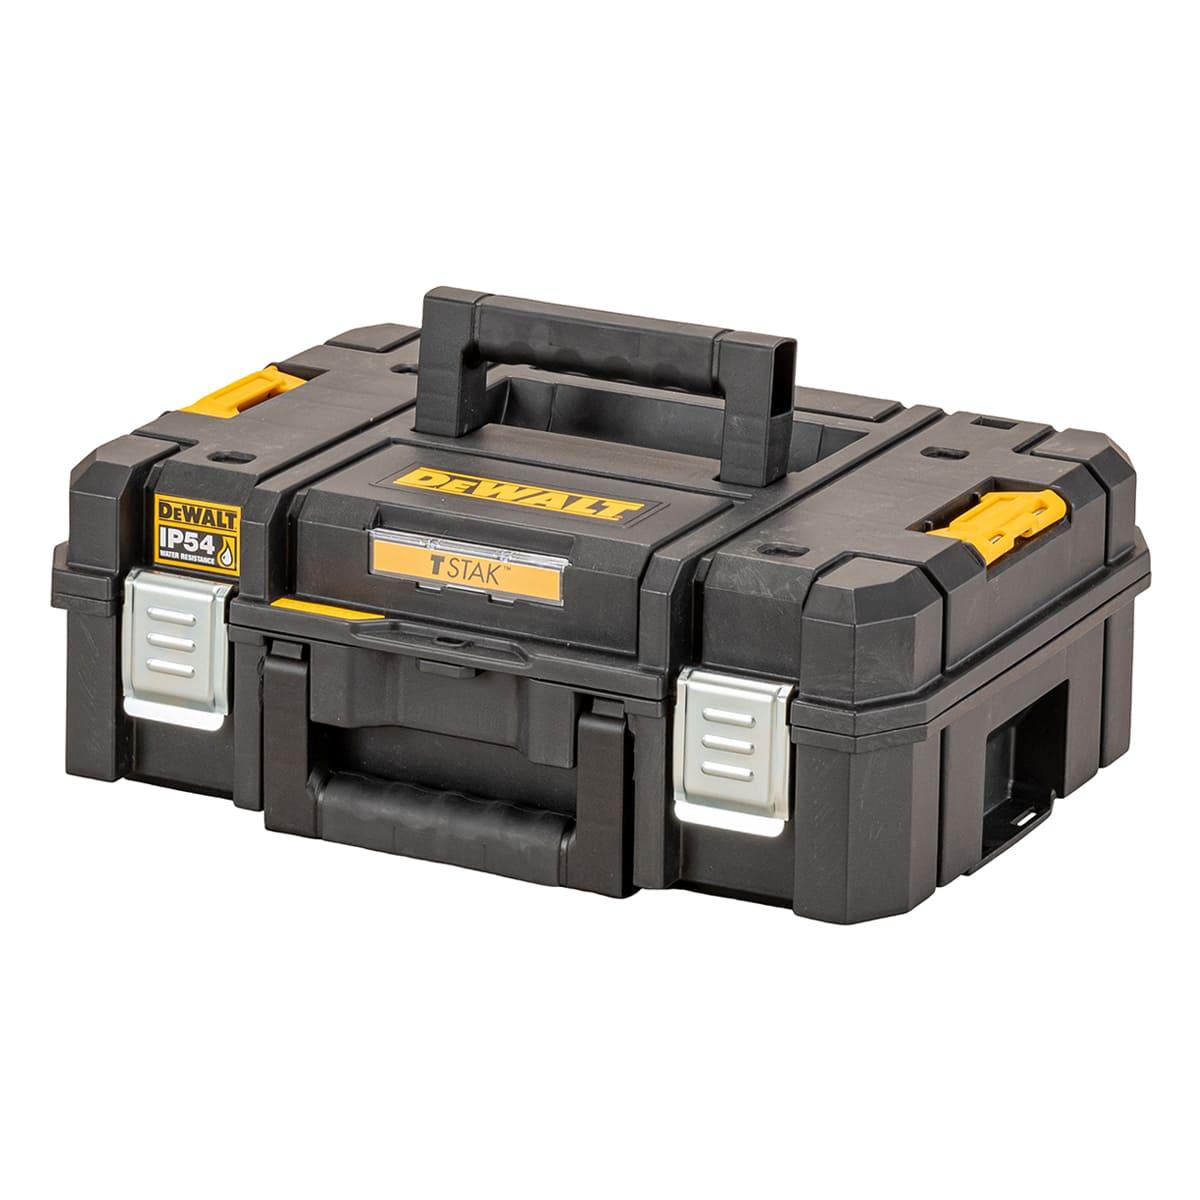 DWST83345-1 TSTAK ティースタック 人気の製品 スモールボックス 保証付き 海外 DeWALT デウォルト 正規品